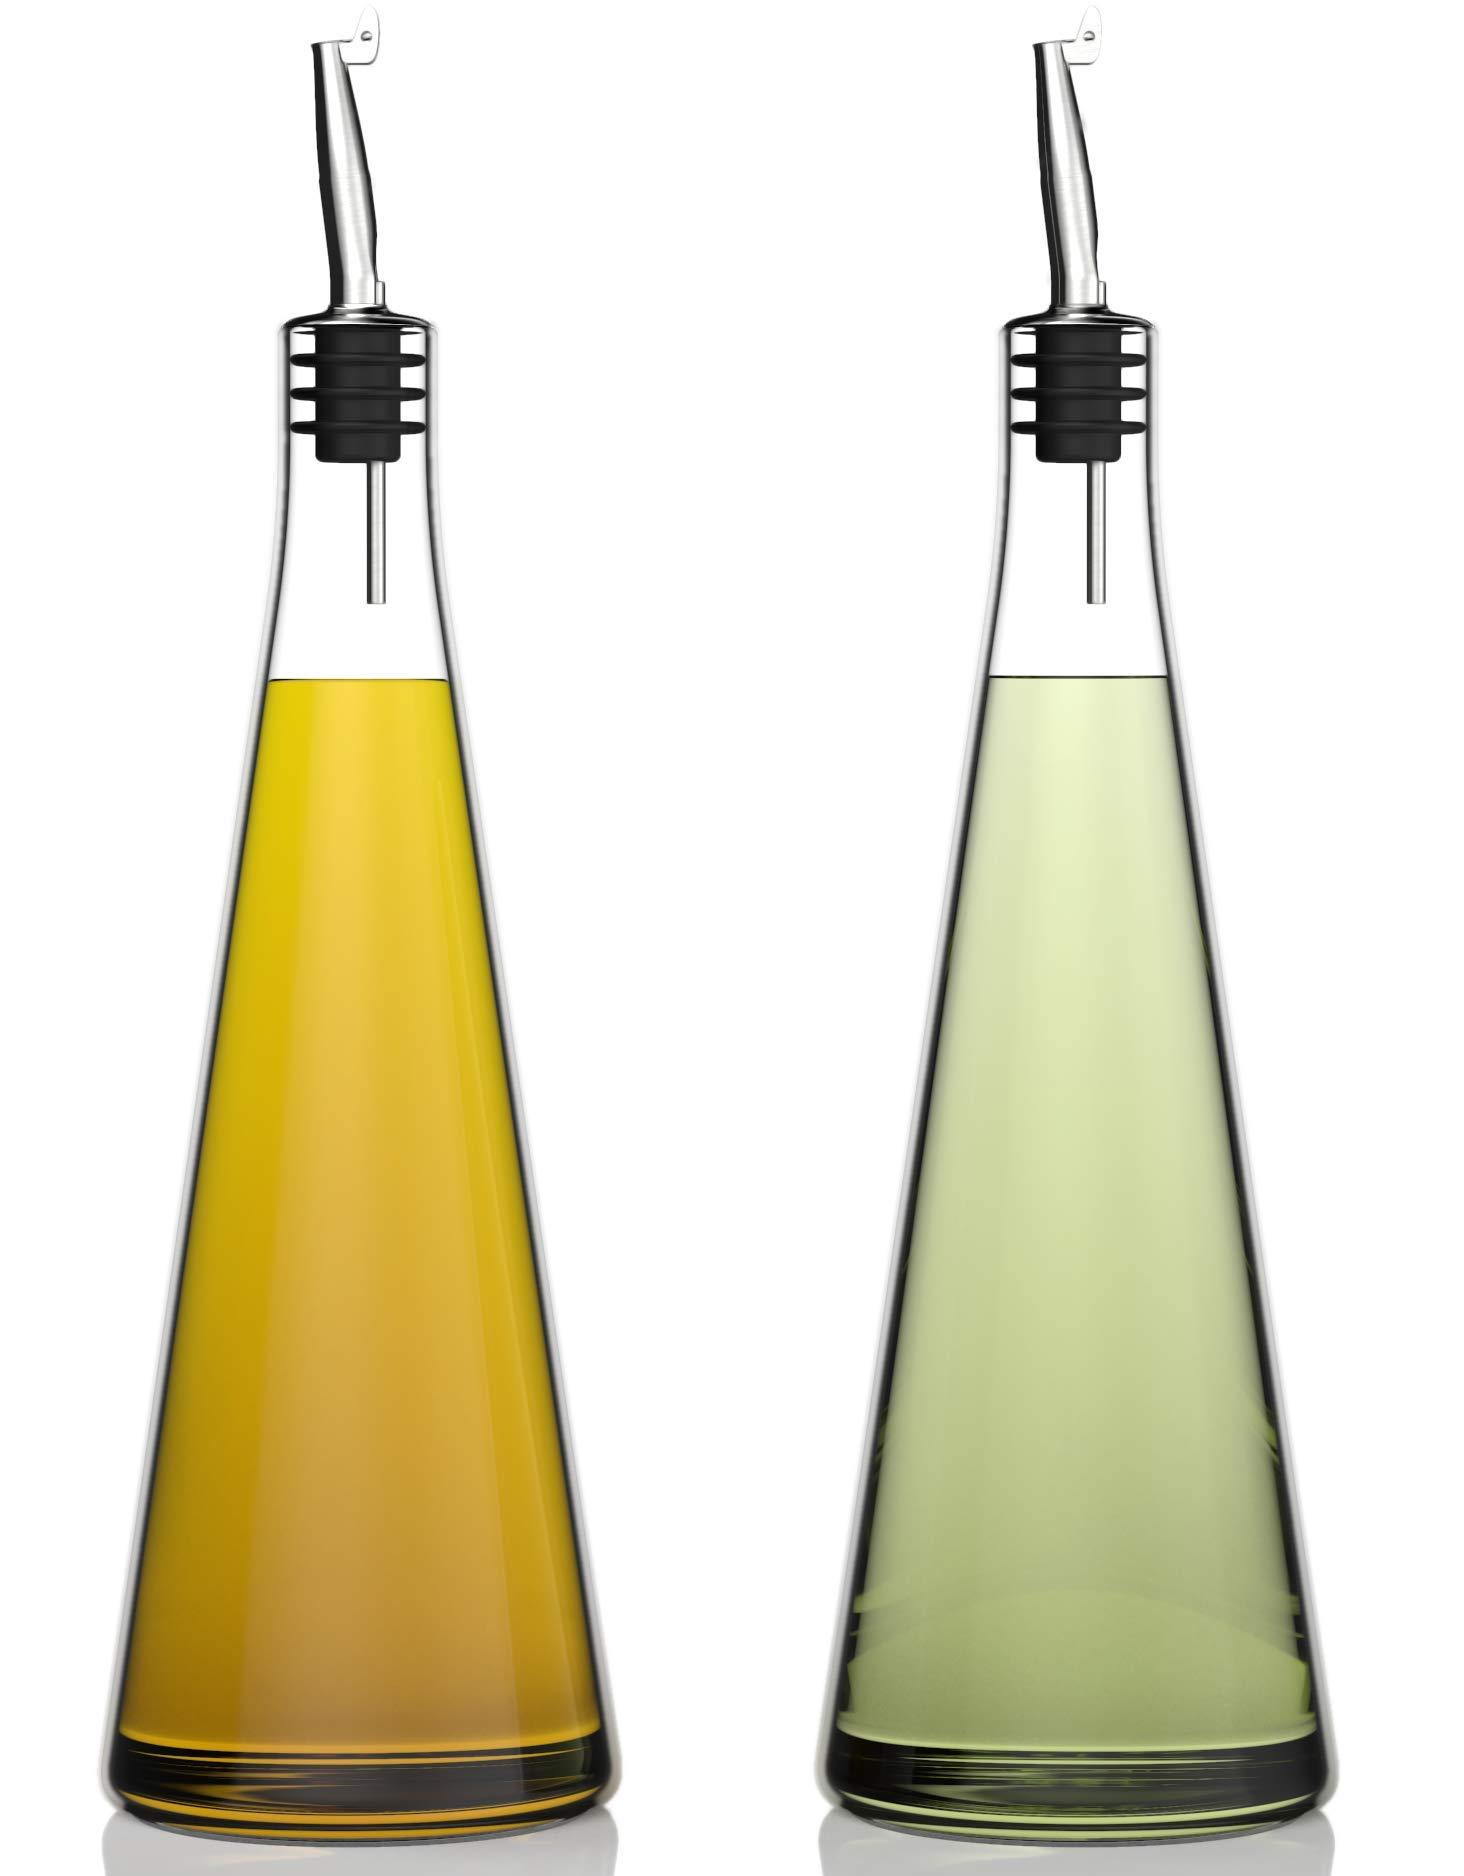 Venero Olive Oil & Vinegar Dispensers, Set of 2 Glass Bottles, Stainless Steel Pourer Spouts & Funnel, 19 oz Dispenser Bottle Set for Kitchen, Cooking Oil Cruet, Salad Dressing Container, Soy Sauce by Venero